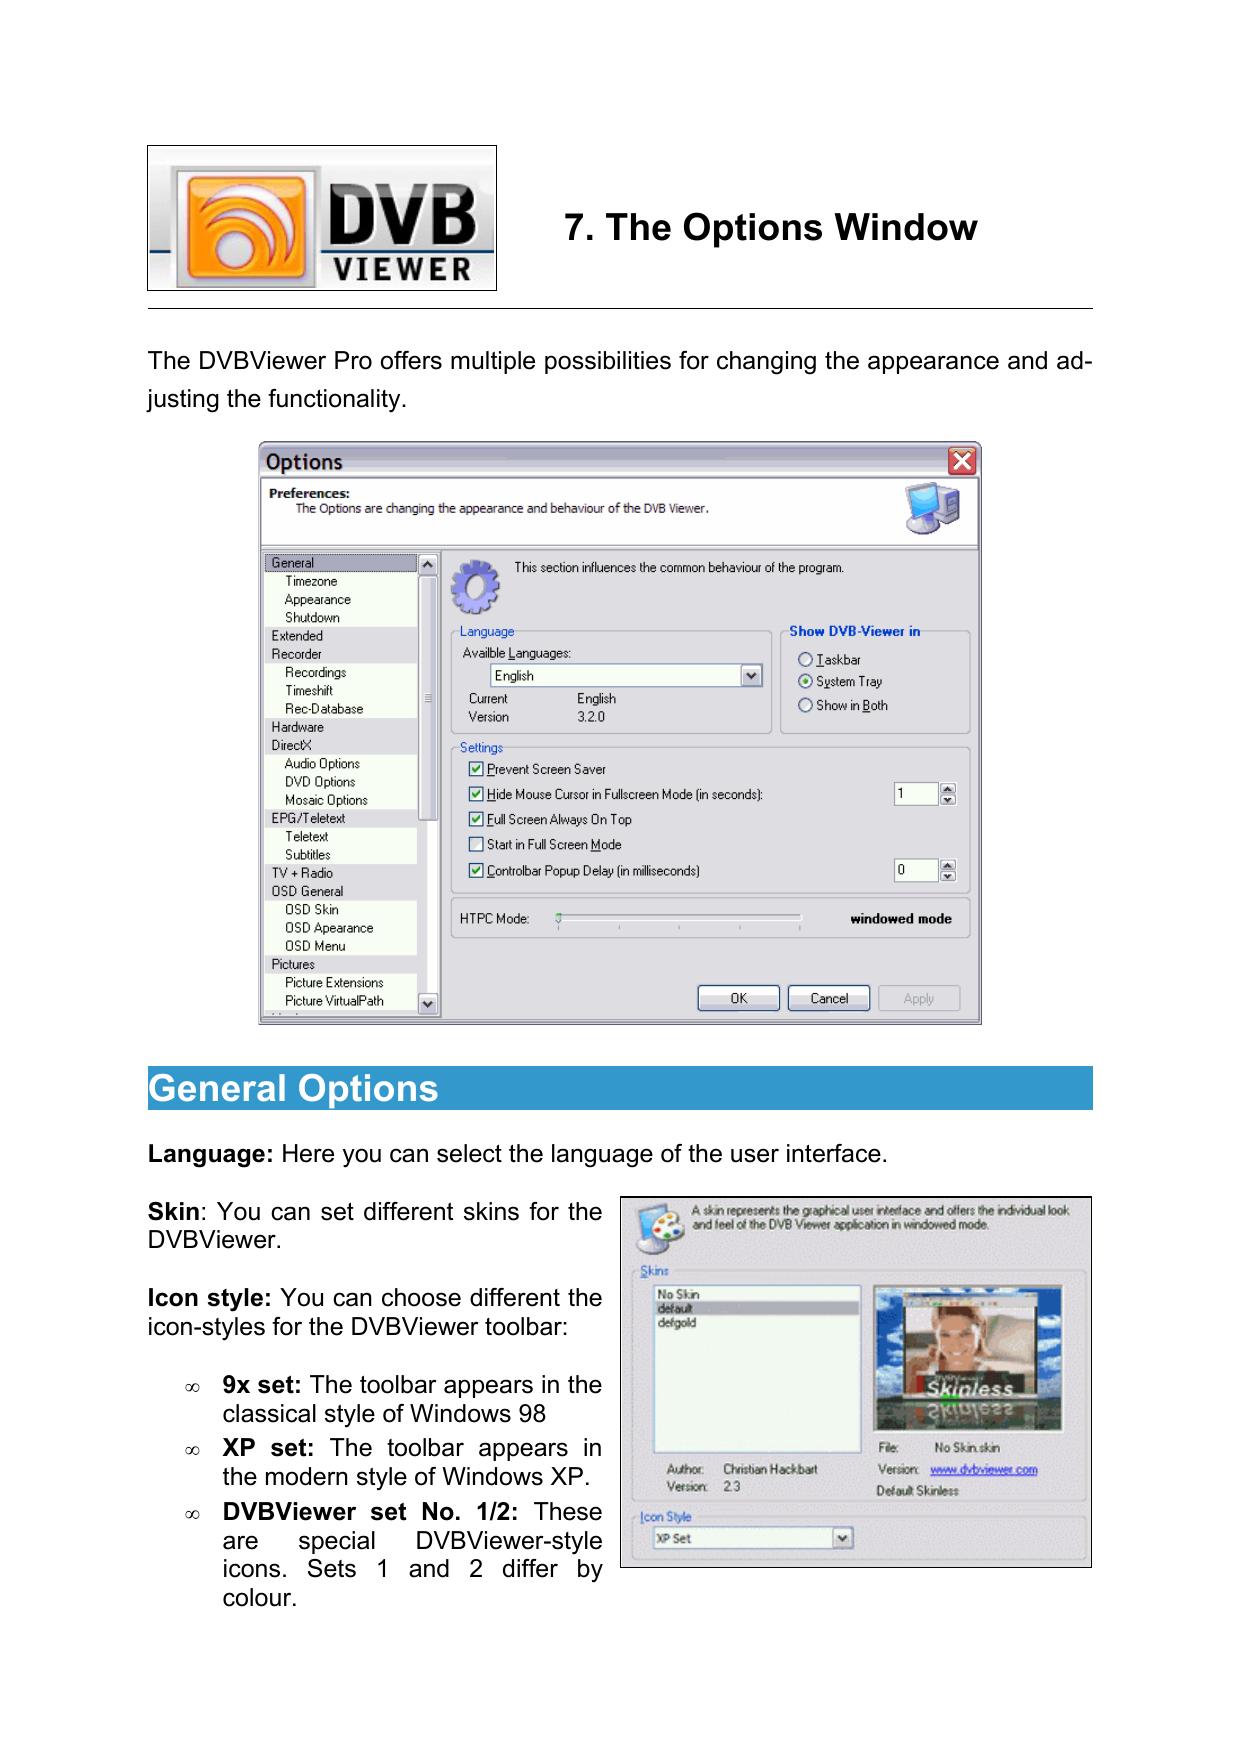 TÉLÉCHARGER DVBVIEWER 4.5 GRATUITEMENT